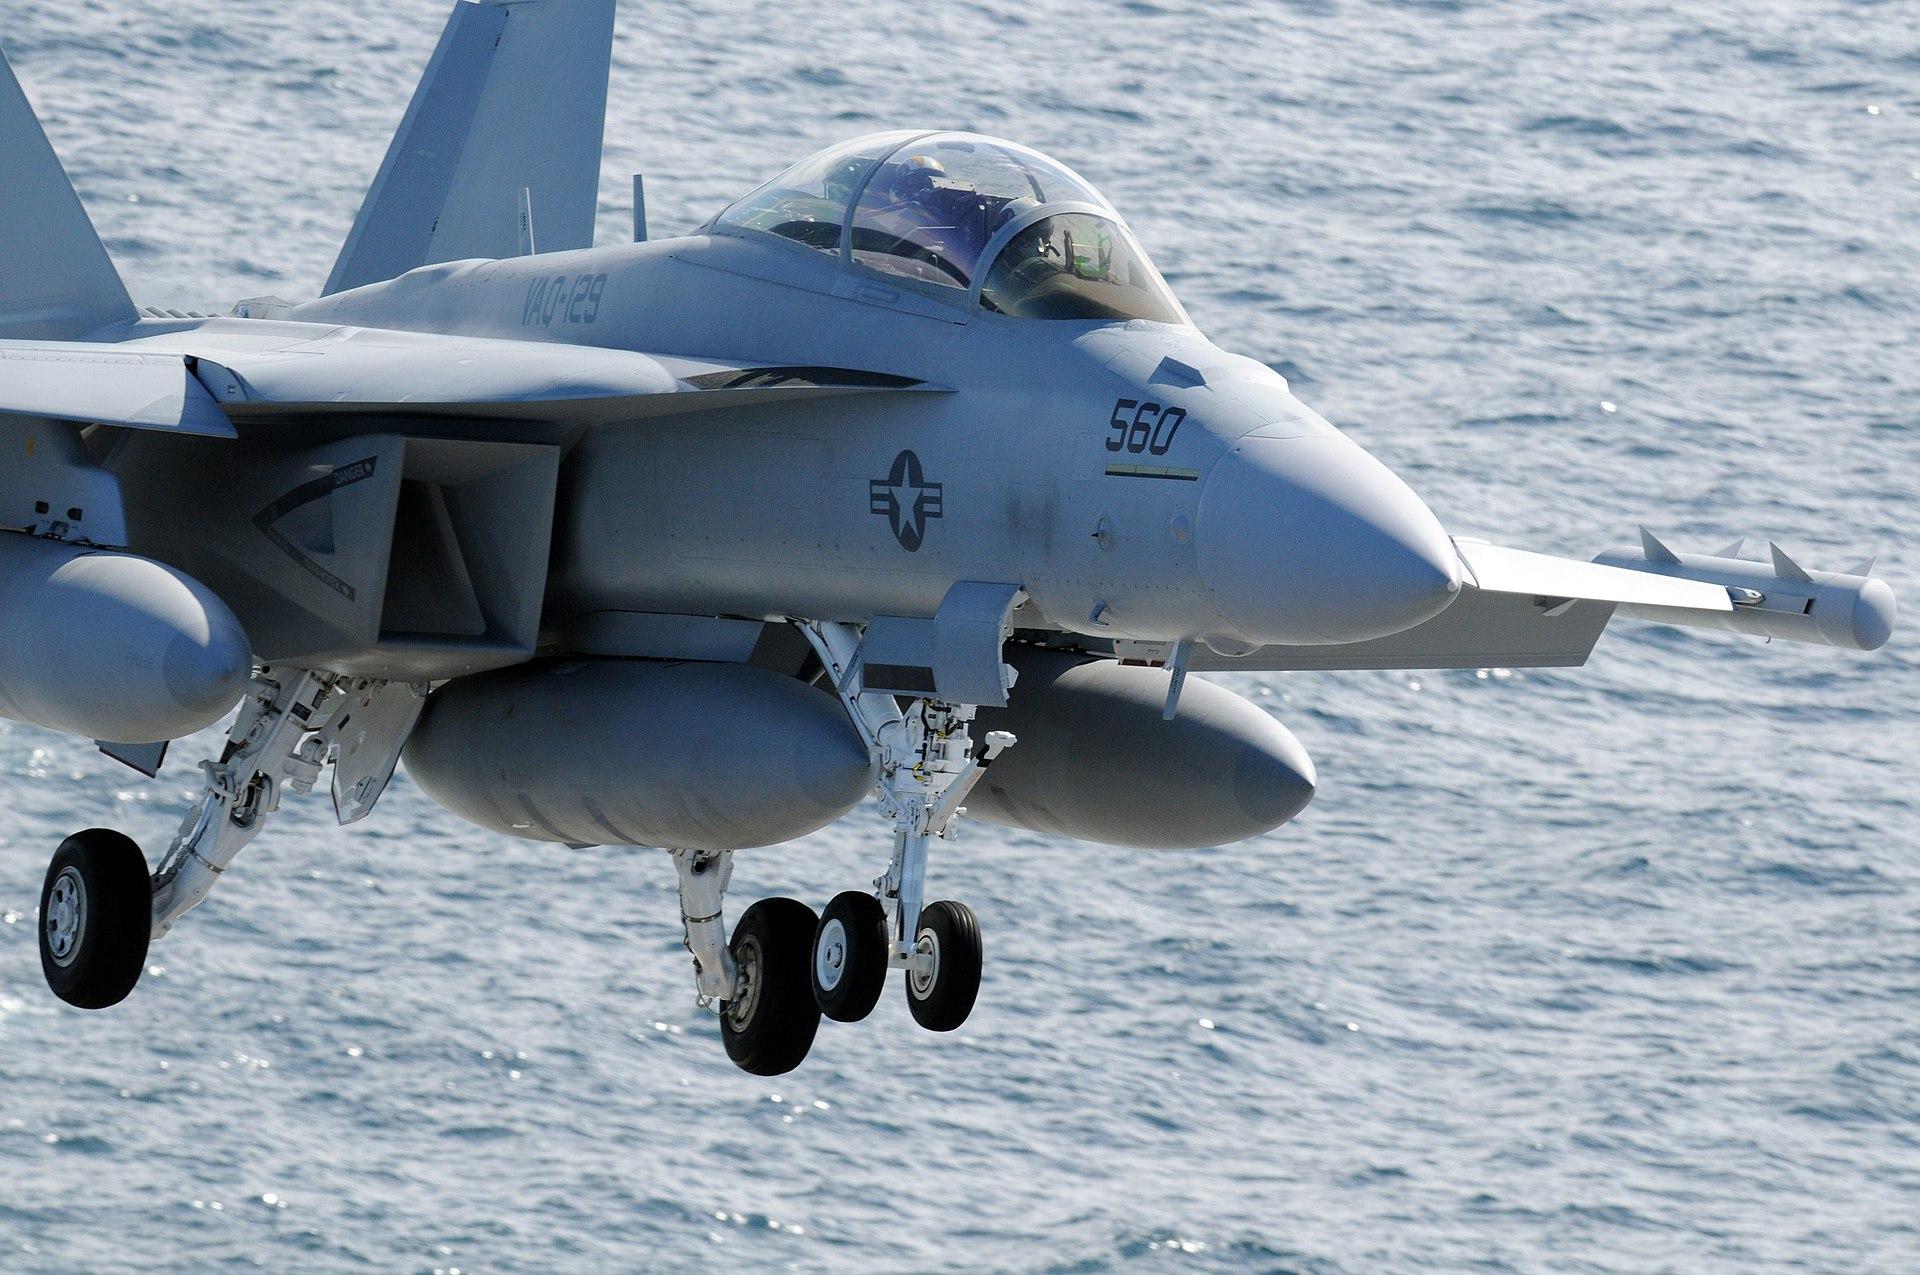 1920px-US_Navy_090217-N-3610L-243_An_EA-